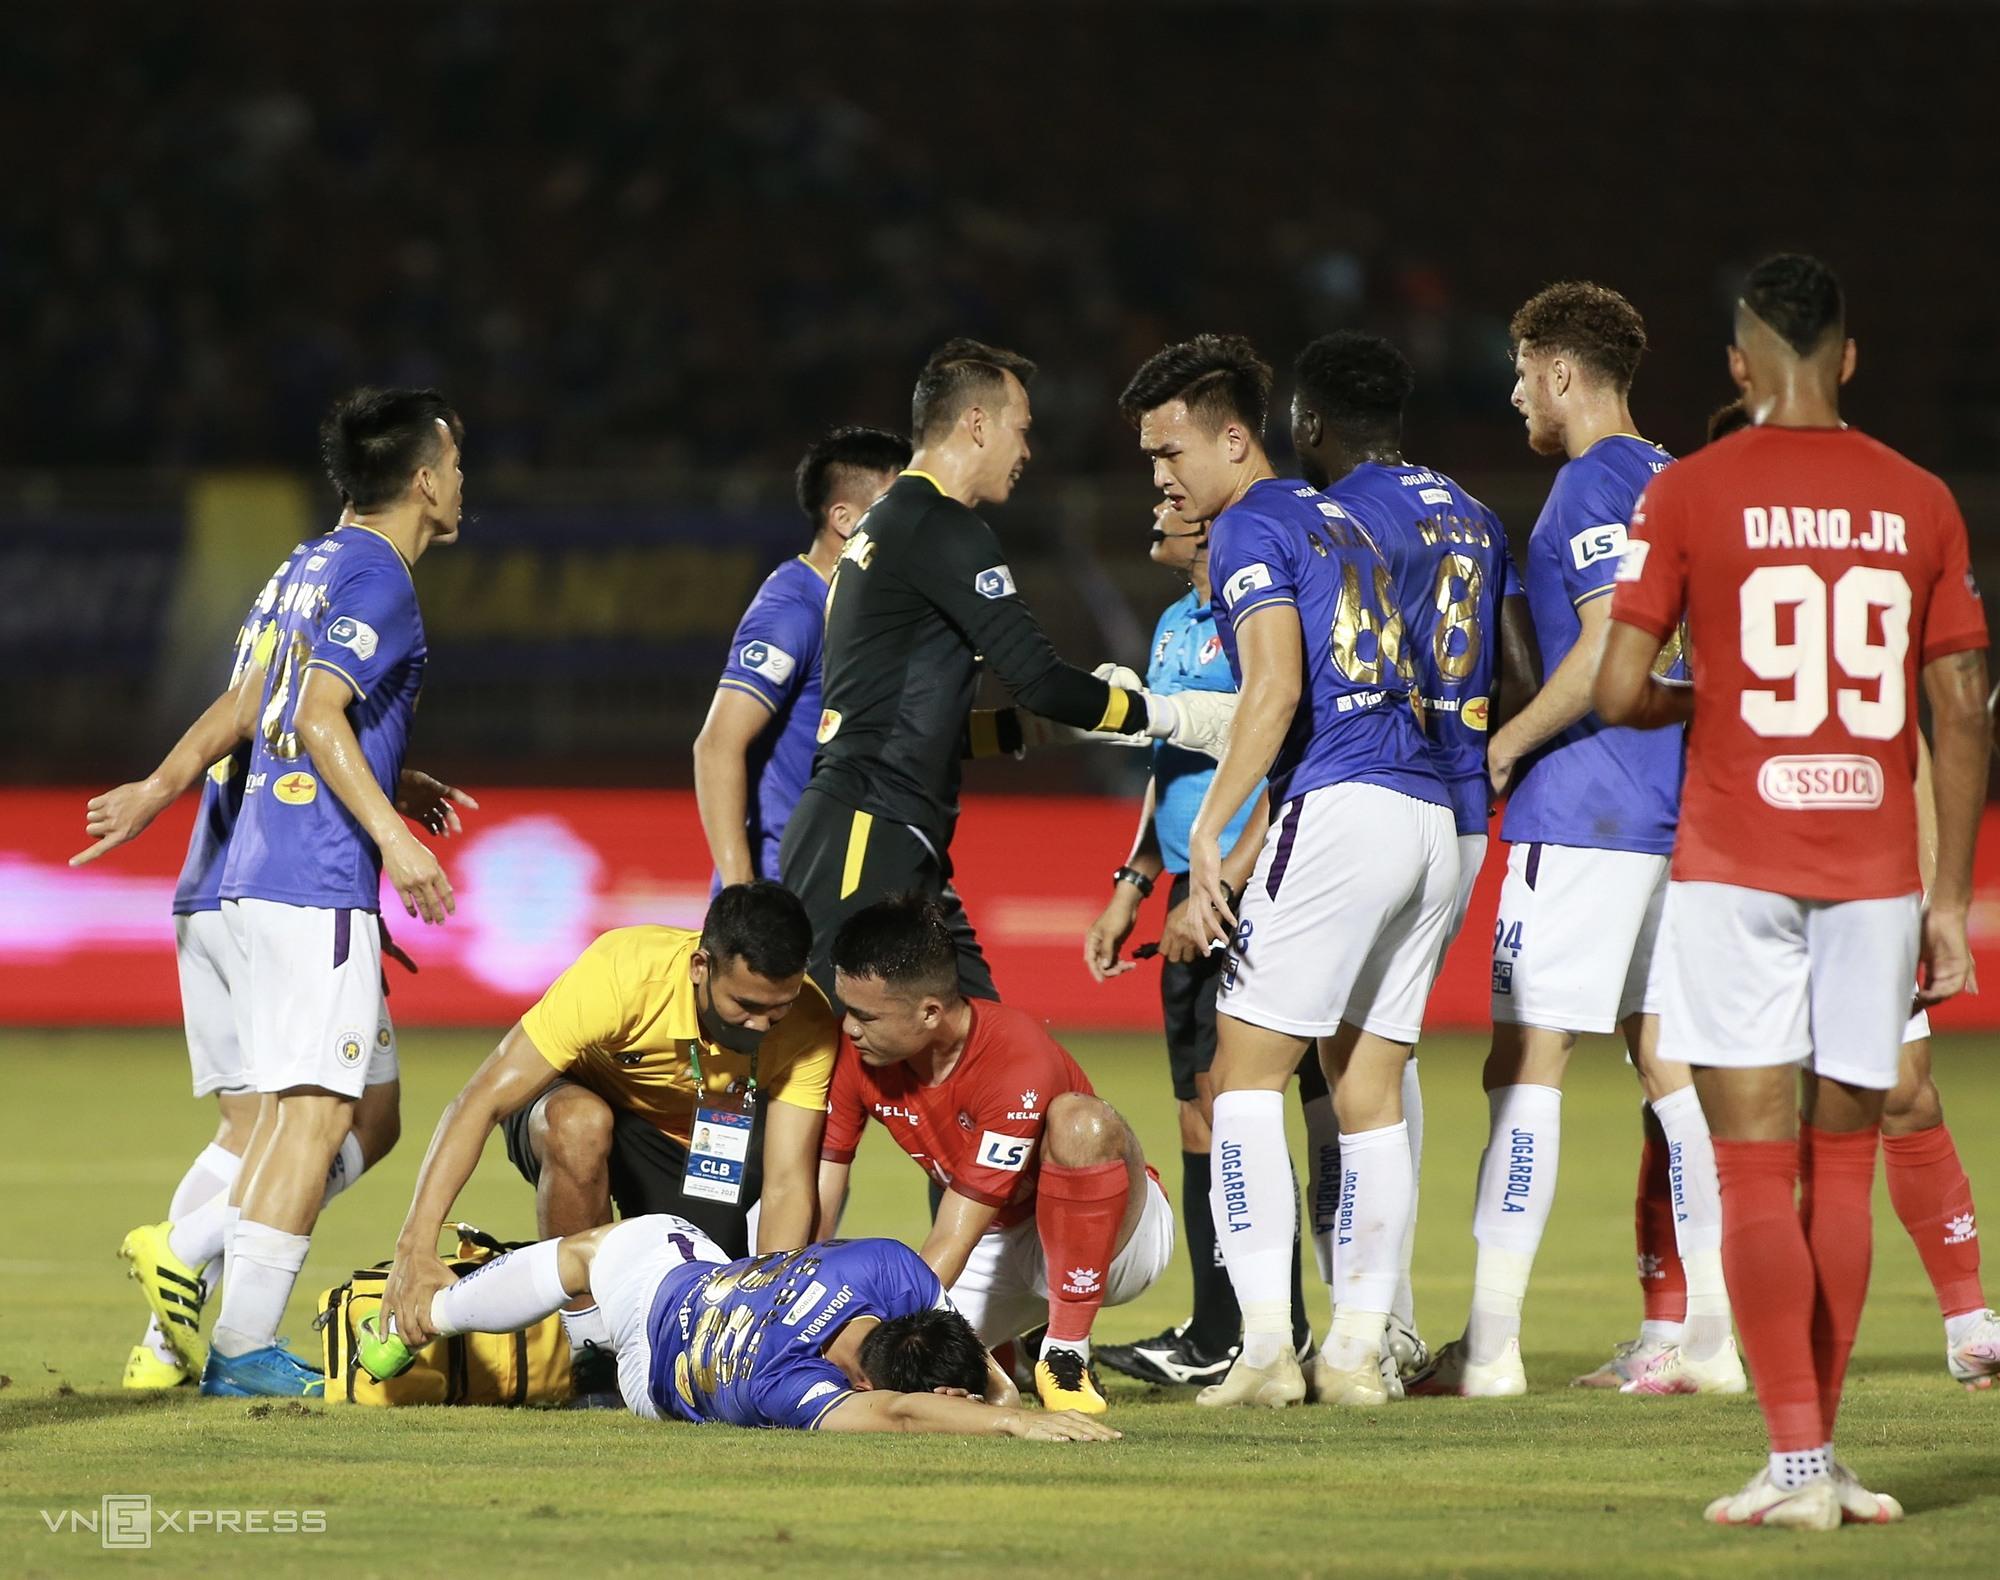 Gambaran cedera Hung Dung juga akan menghantui sepak bola Vietnam.  Foto: Lam Tho